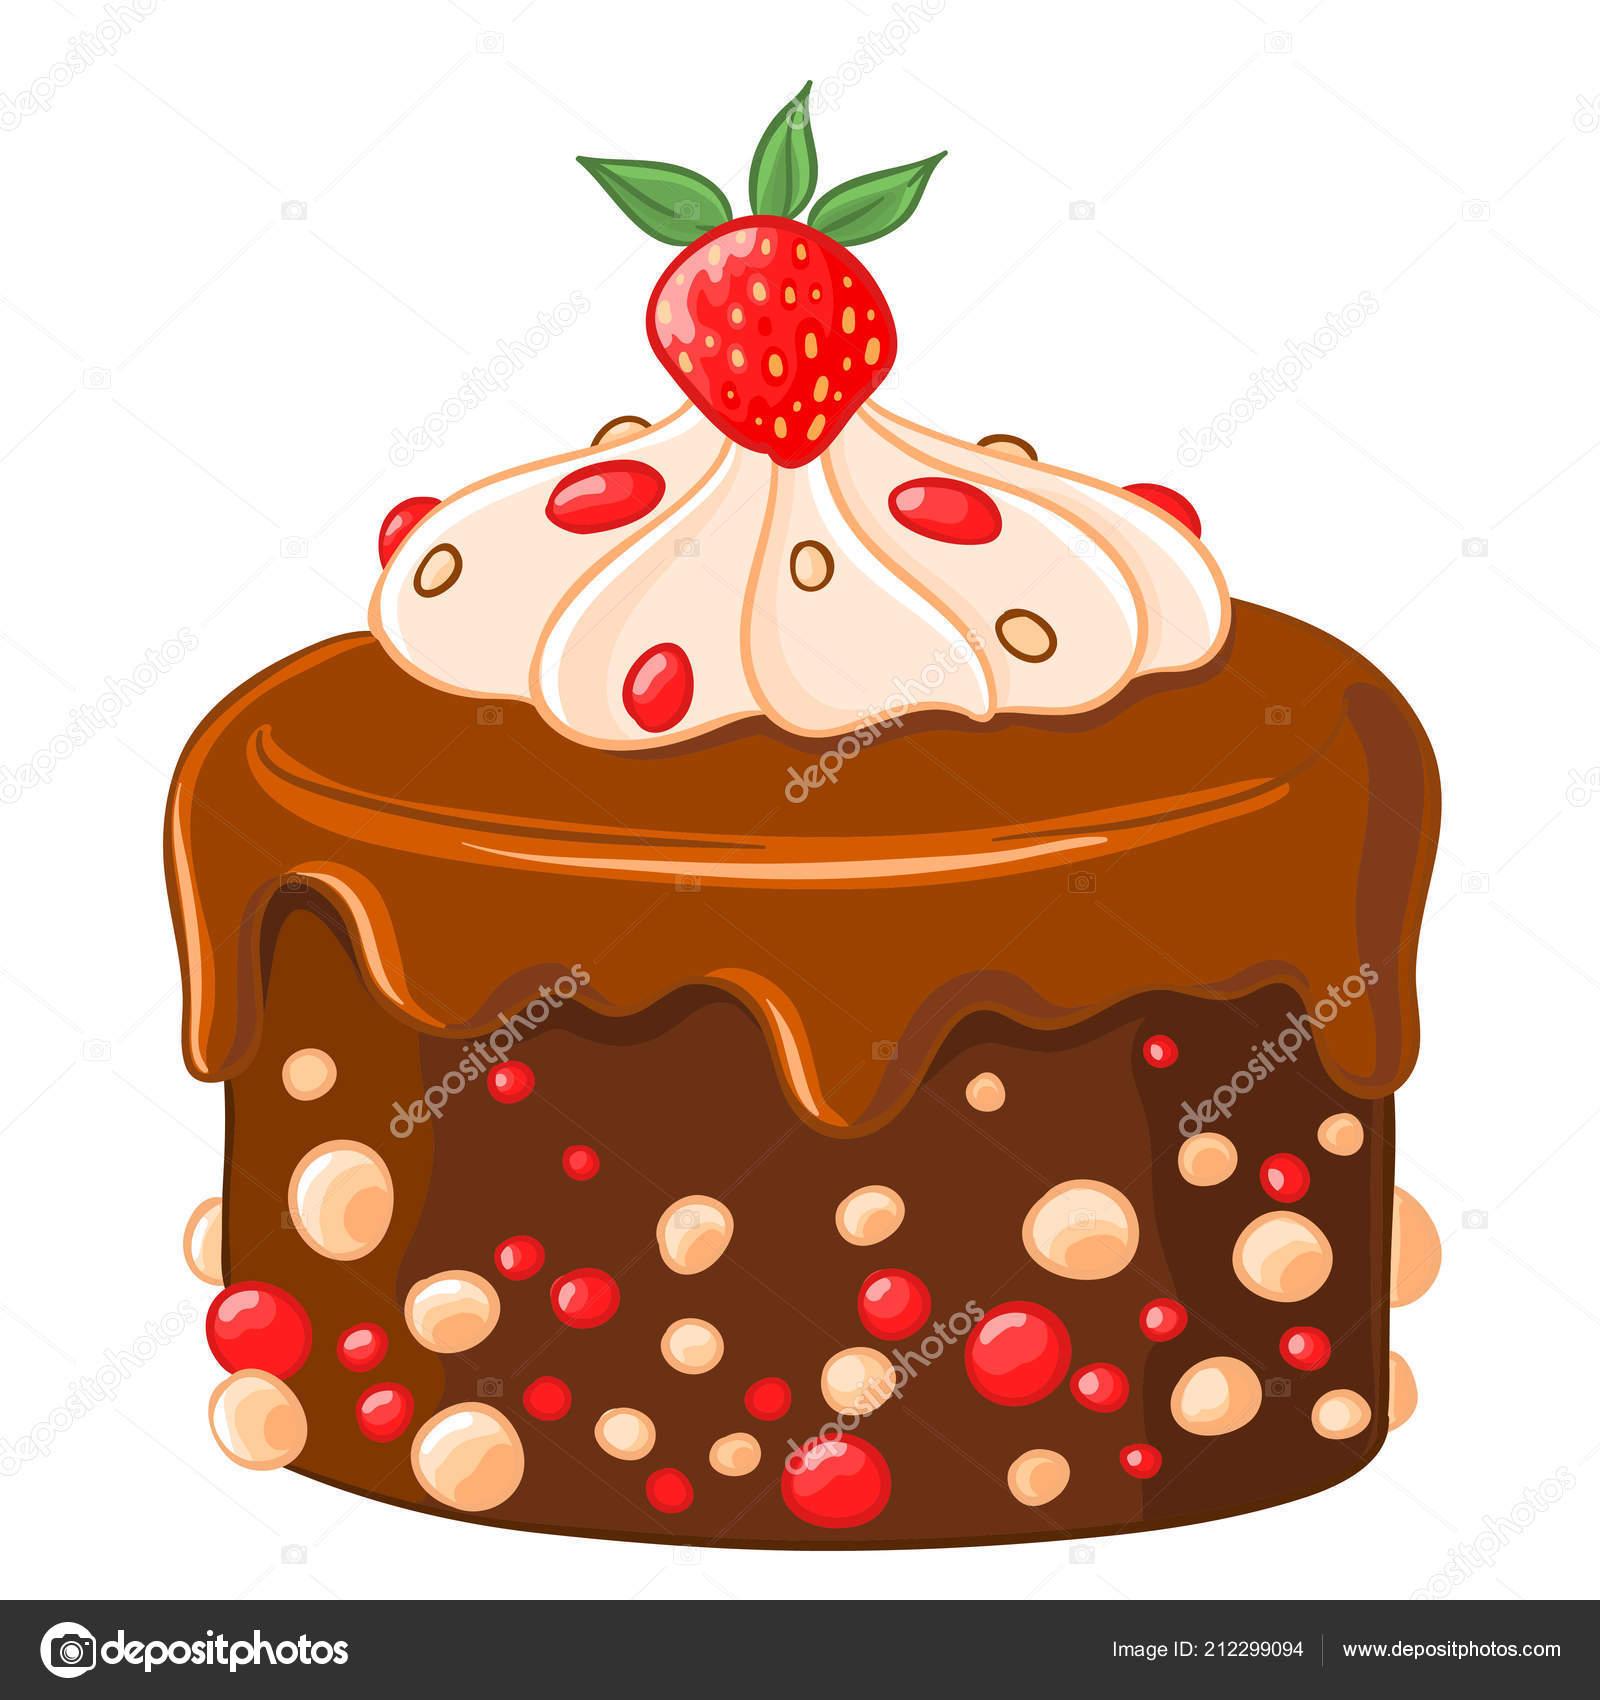 Cartoon Symbol Schokolade Kaffee Kuchen Mit Karamell Sirup Erdbeeren